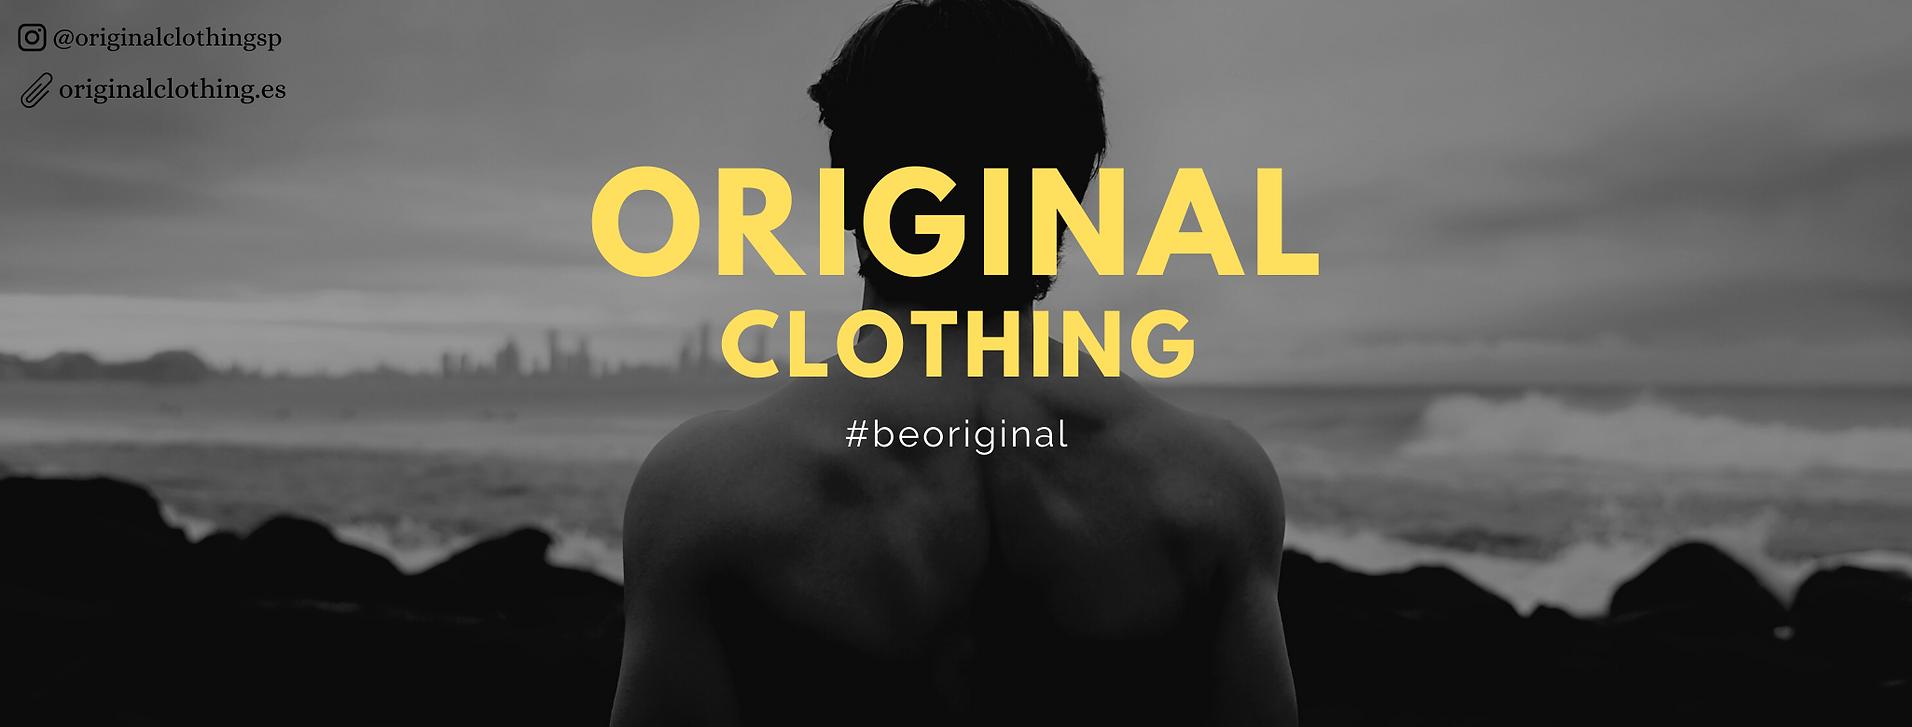 ORIGINAL CLOTHING.png